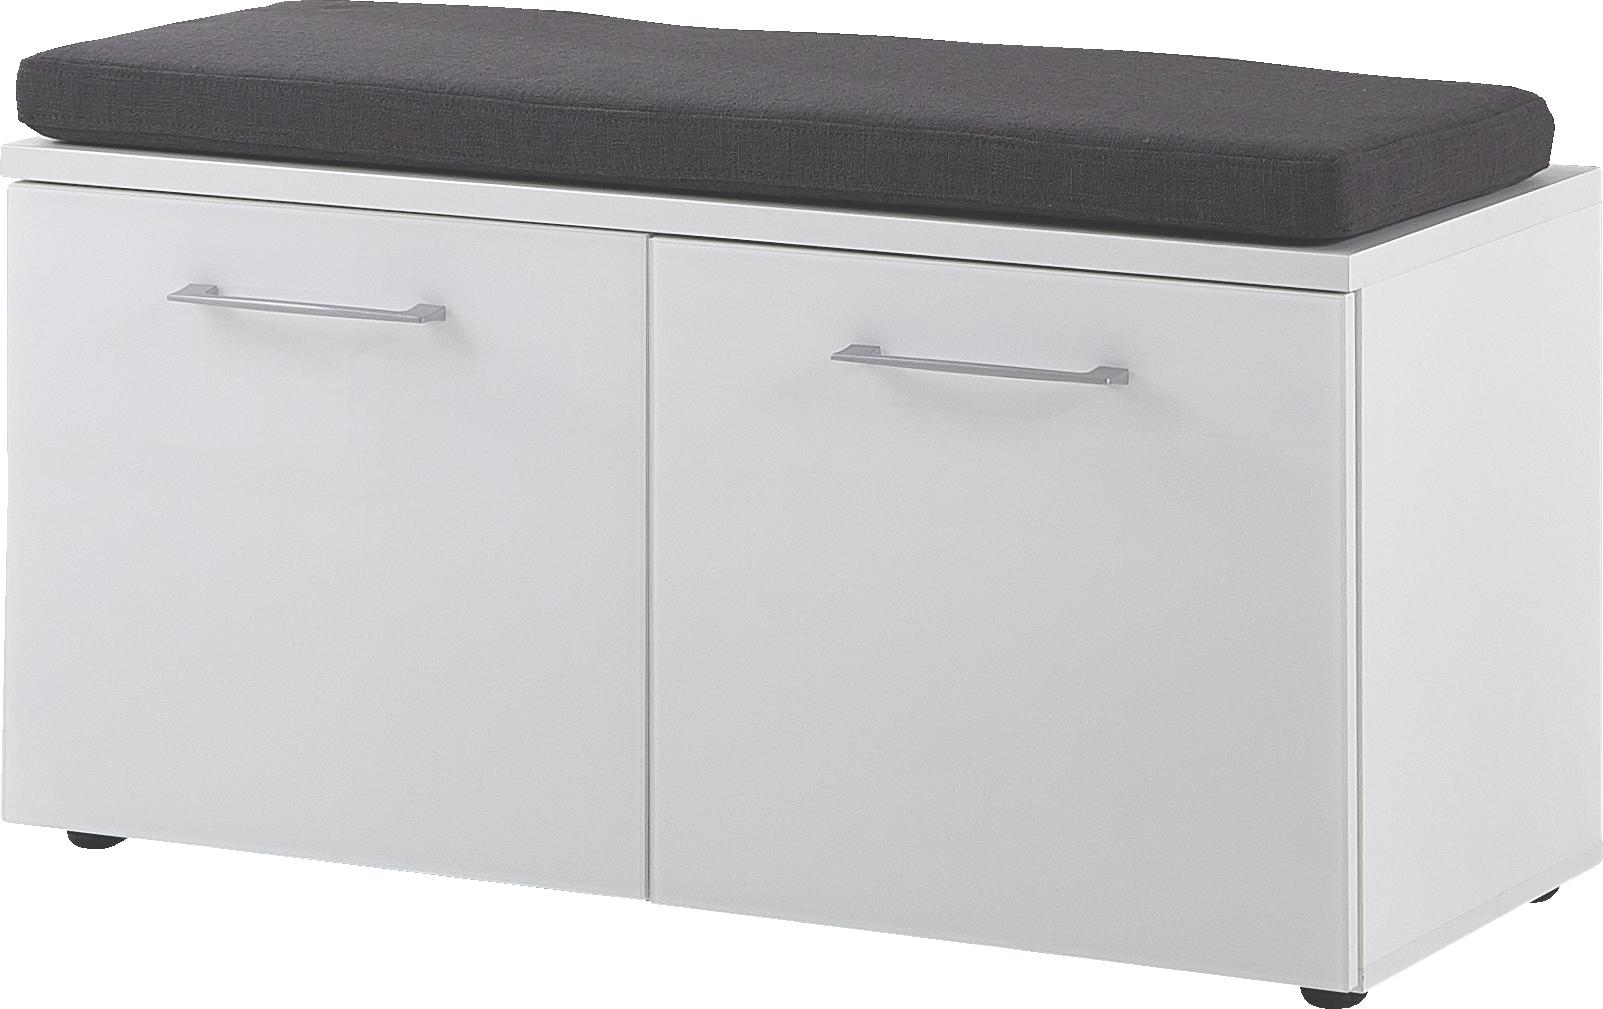 Schoenenbank Scalea 47 cm hoog in wit